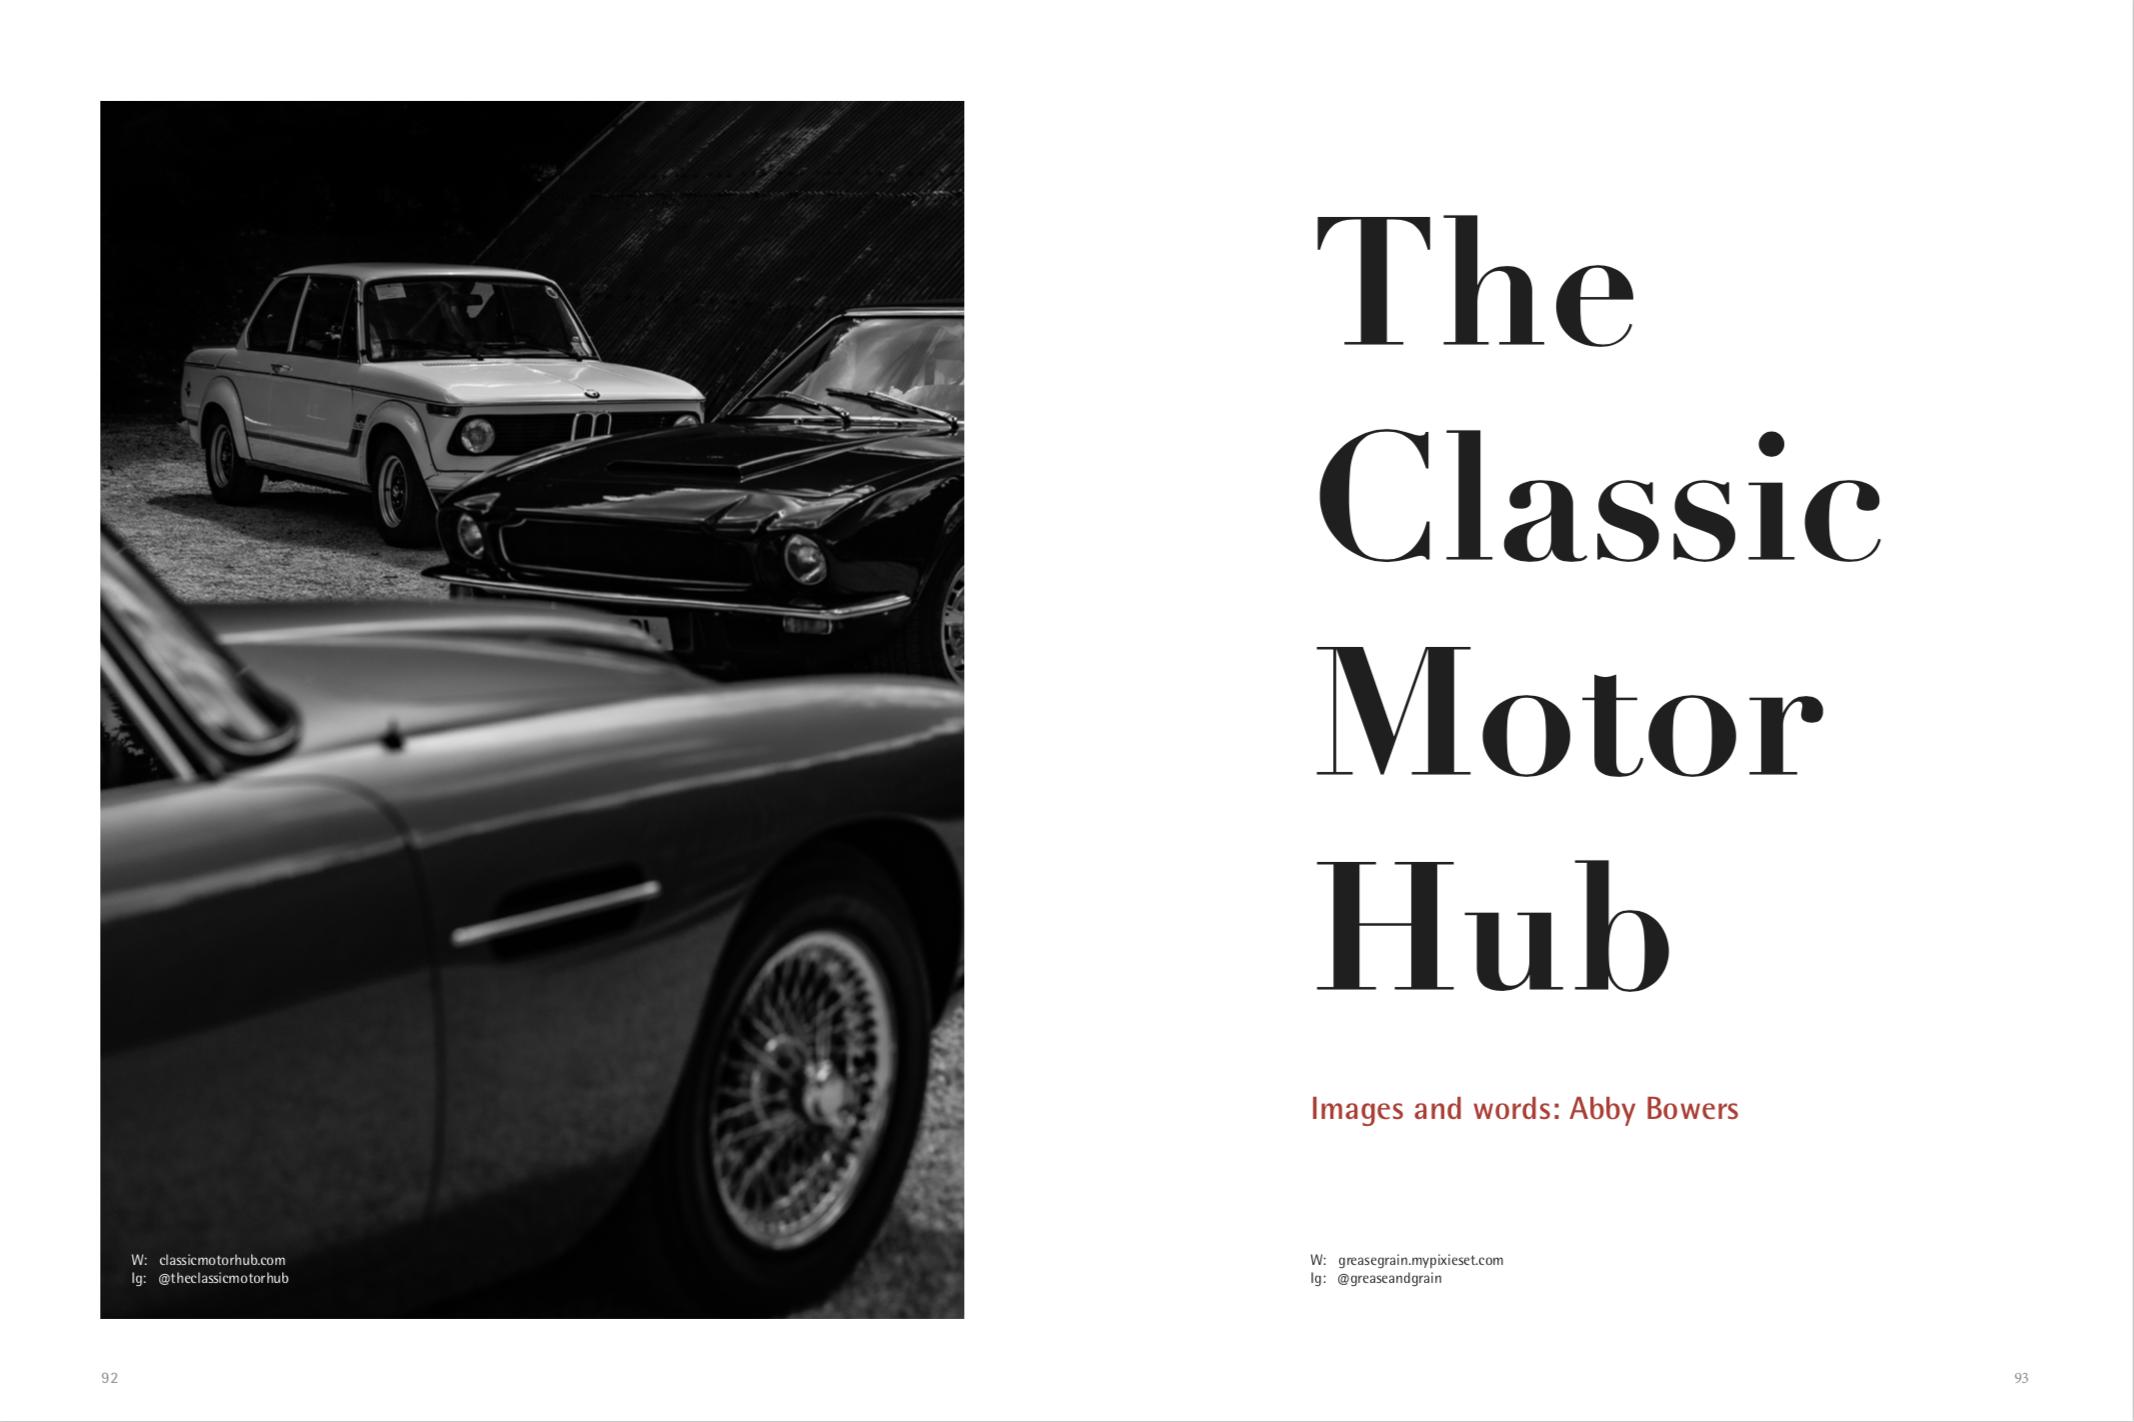 The Classic Motor Hub